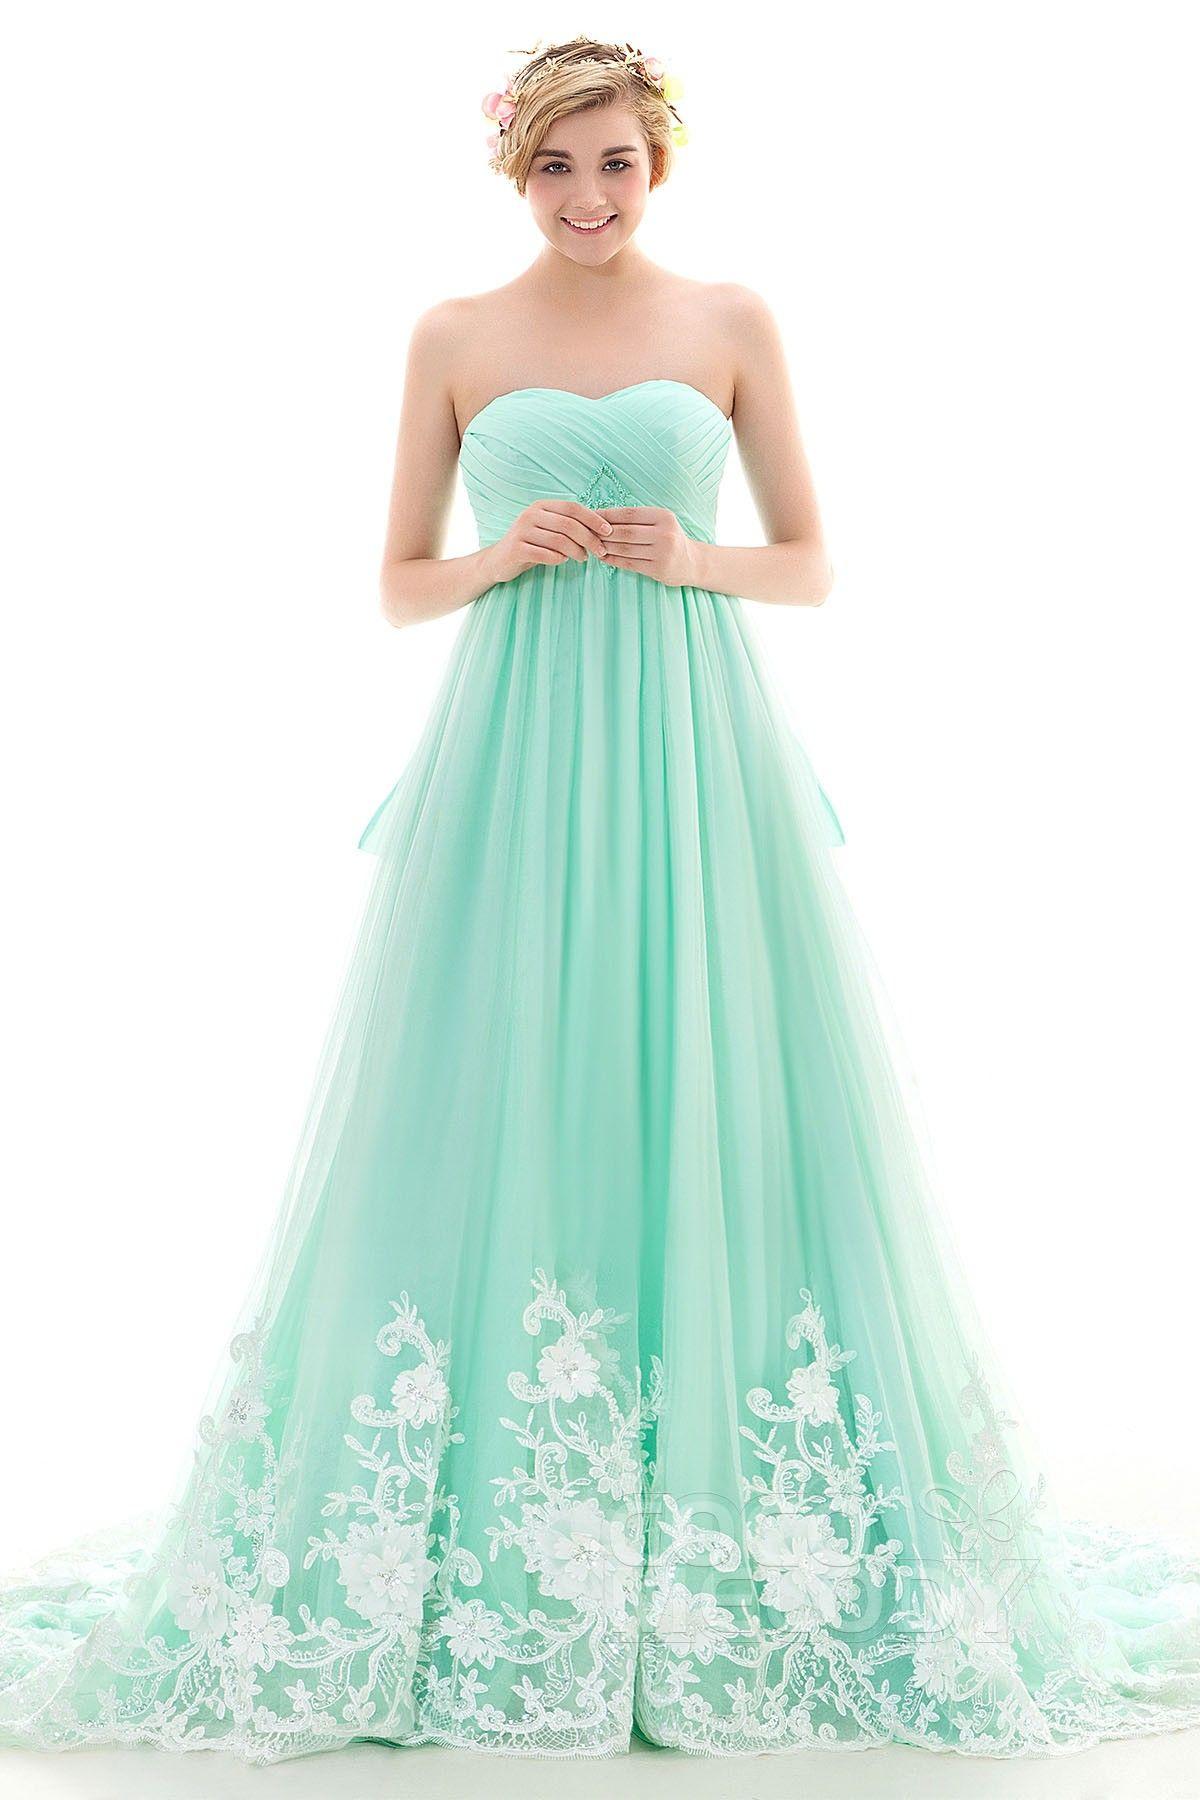 Ld 4027 Beads Mint Green Color Dress